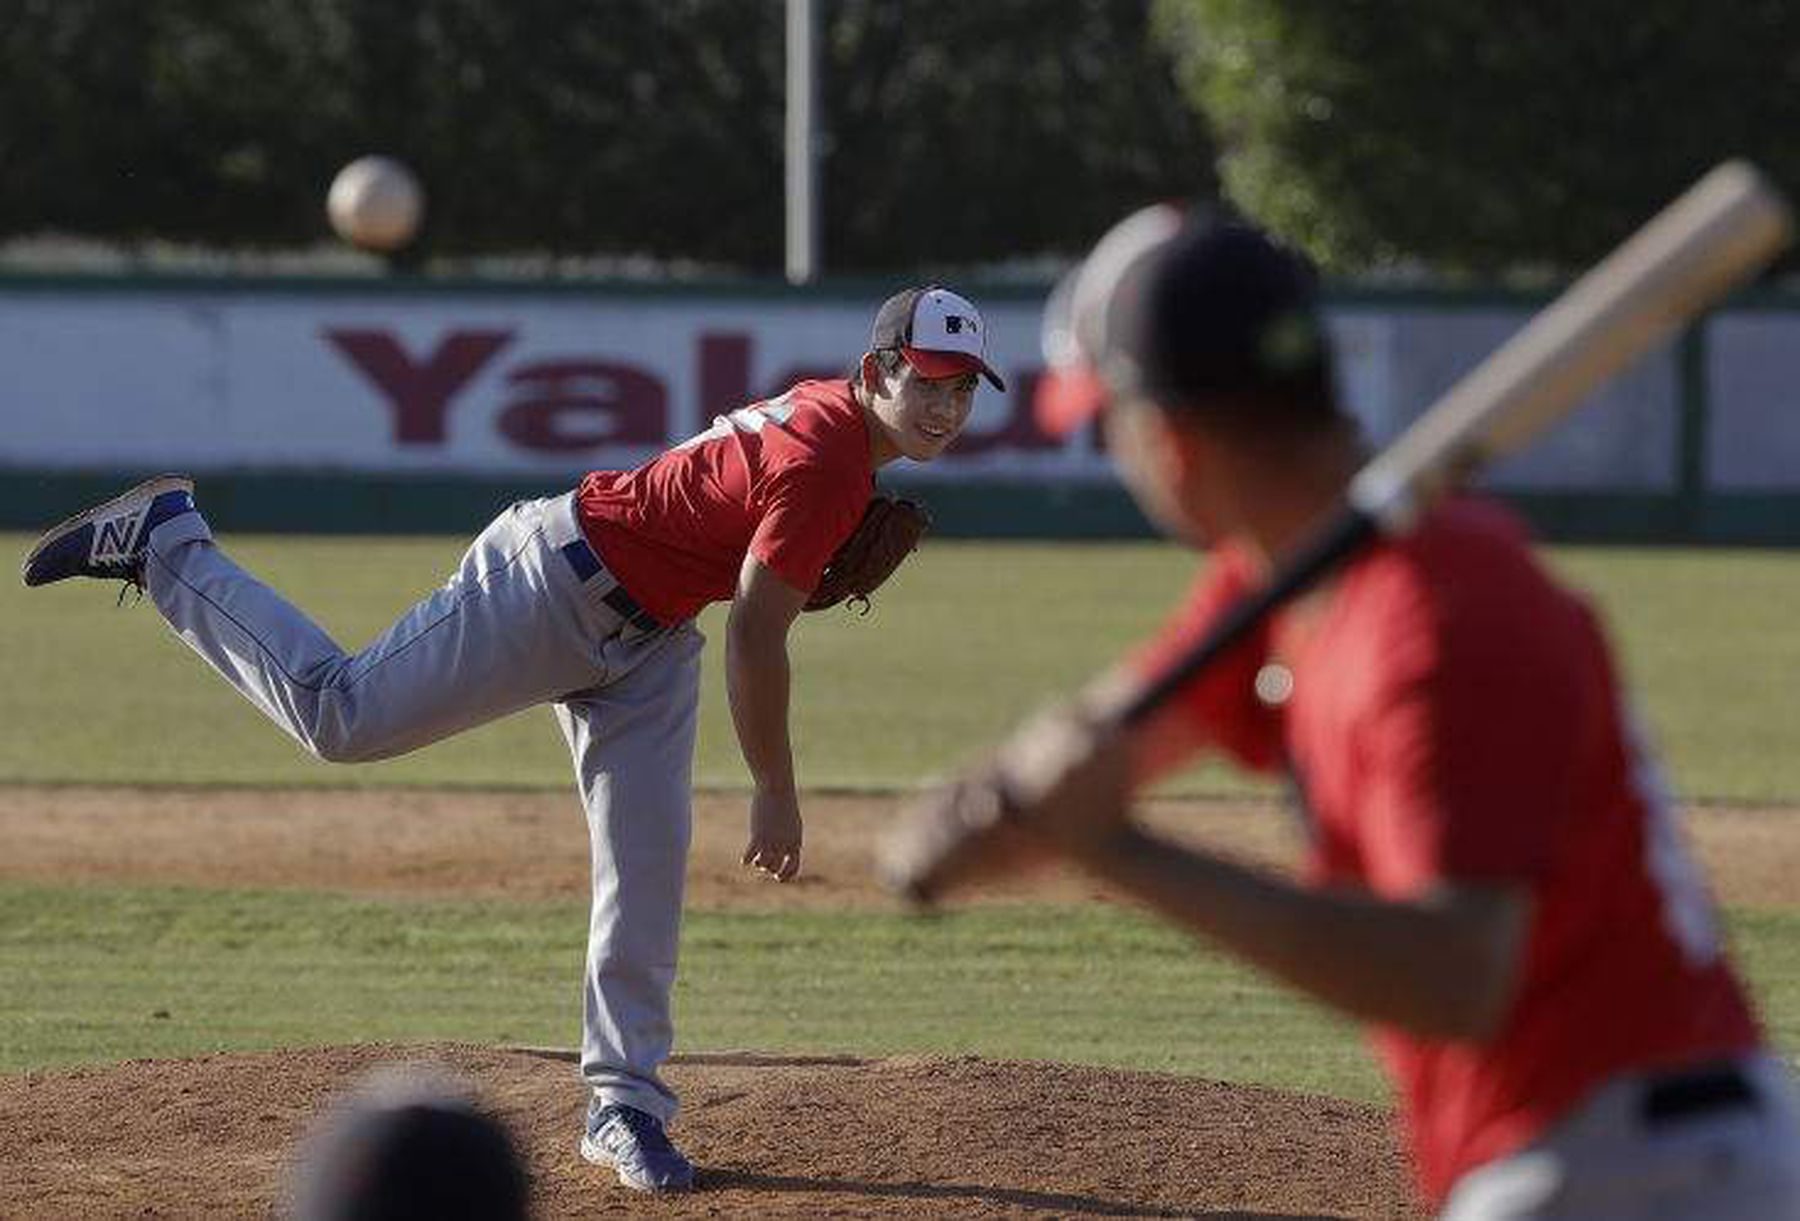 Brazil's 16-year-old baseball wonder turning MLB heads